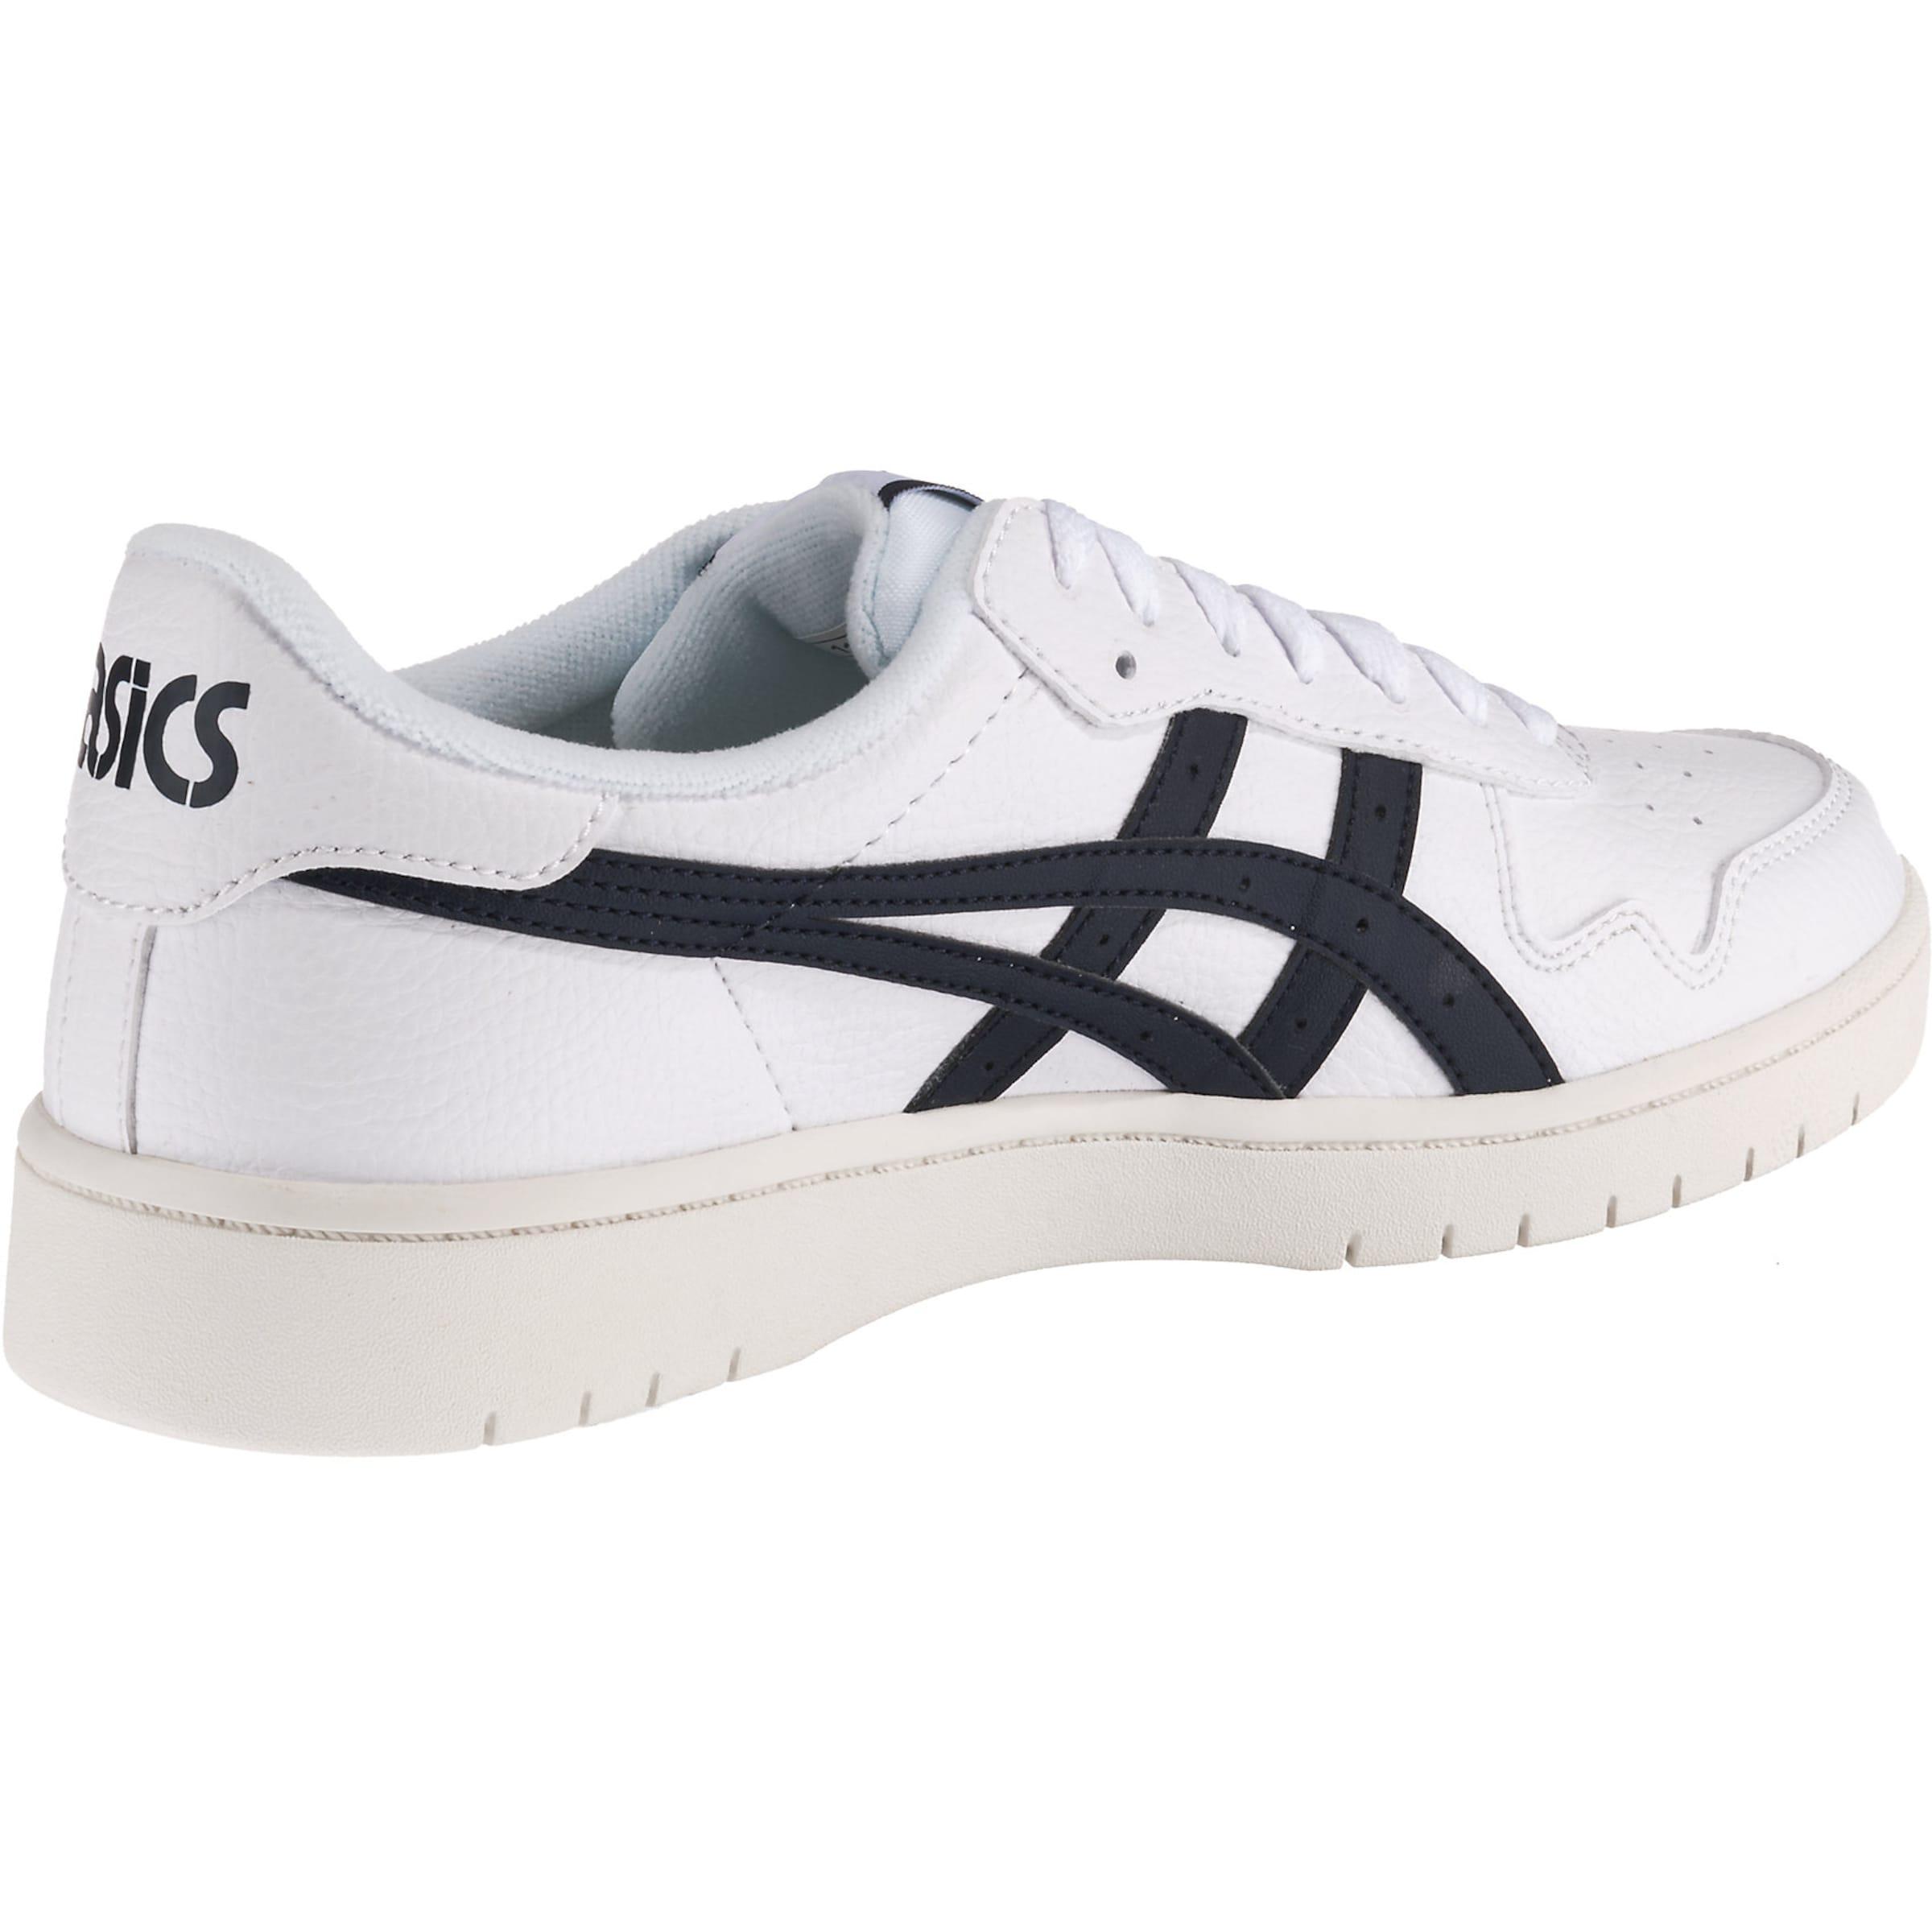 S' Asics 'japan Weiß Tiger Sneaker In PN8kOn0wX